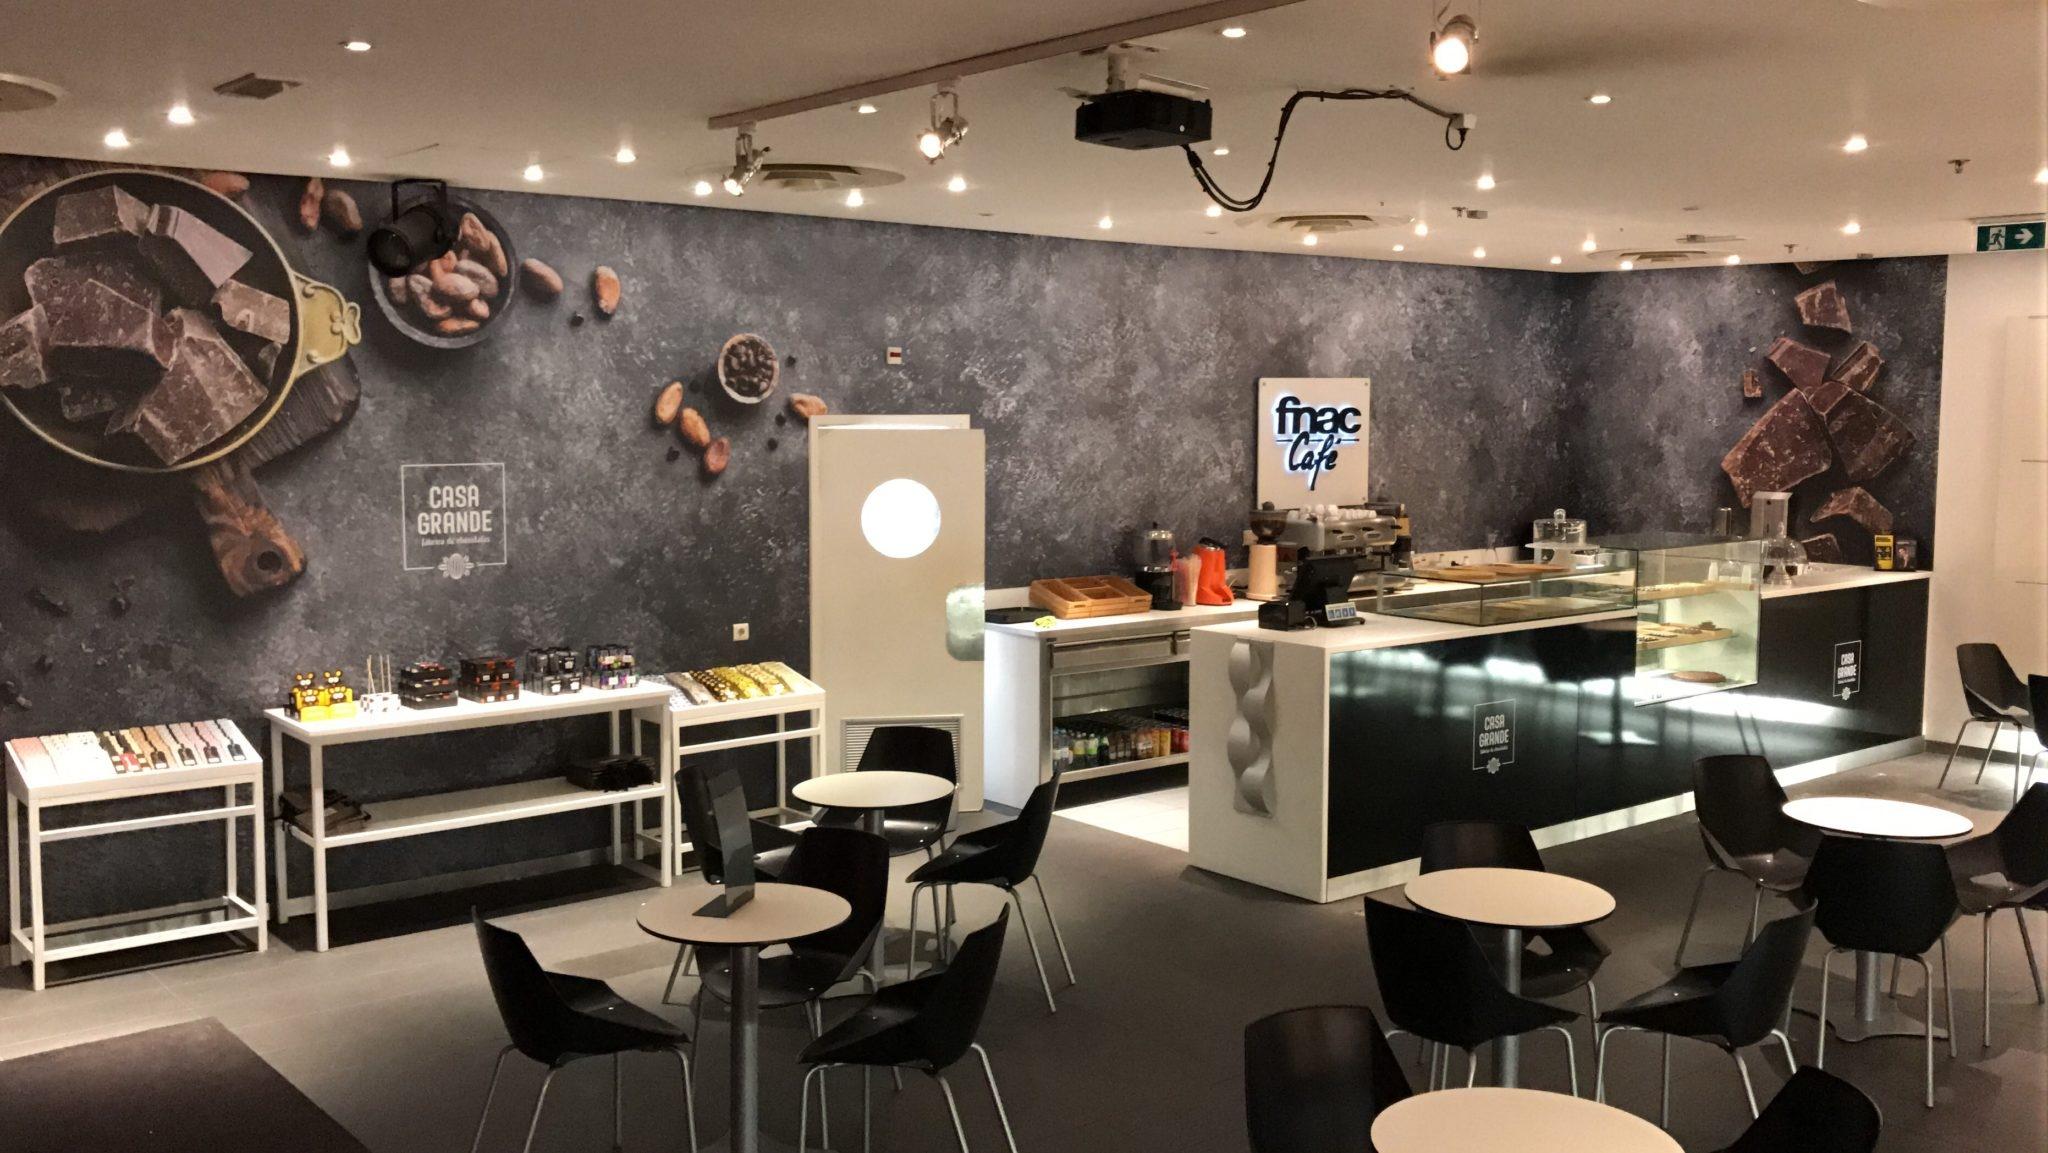 Fnac Café